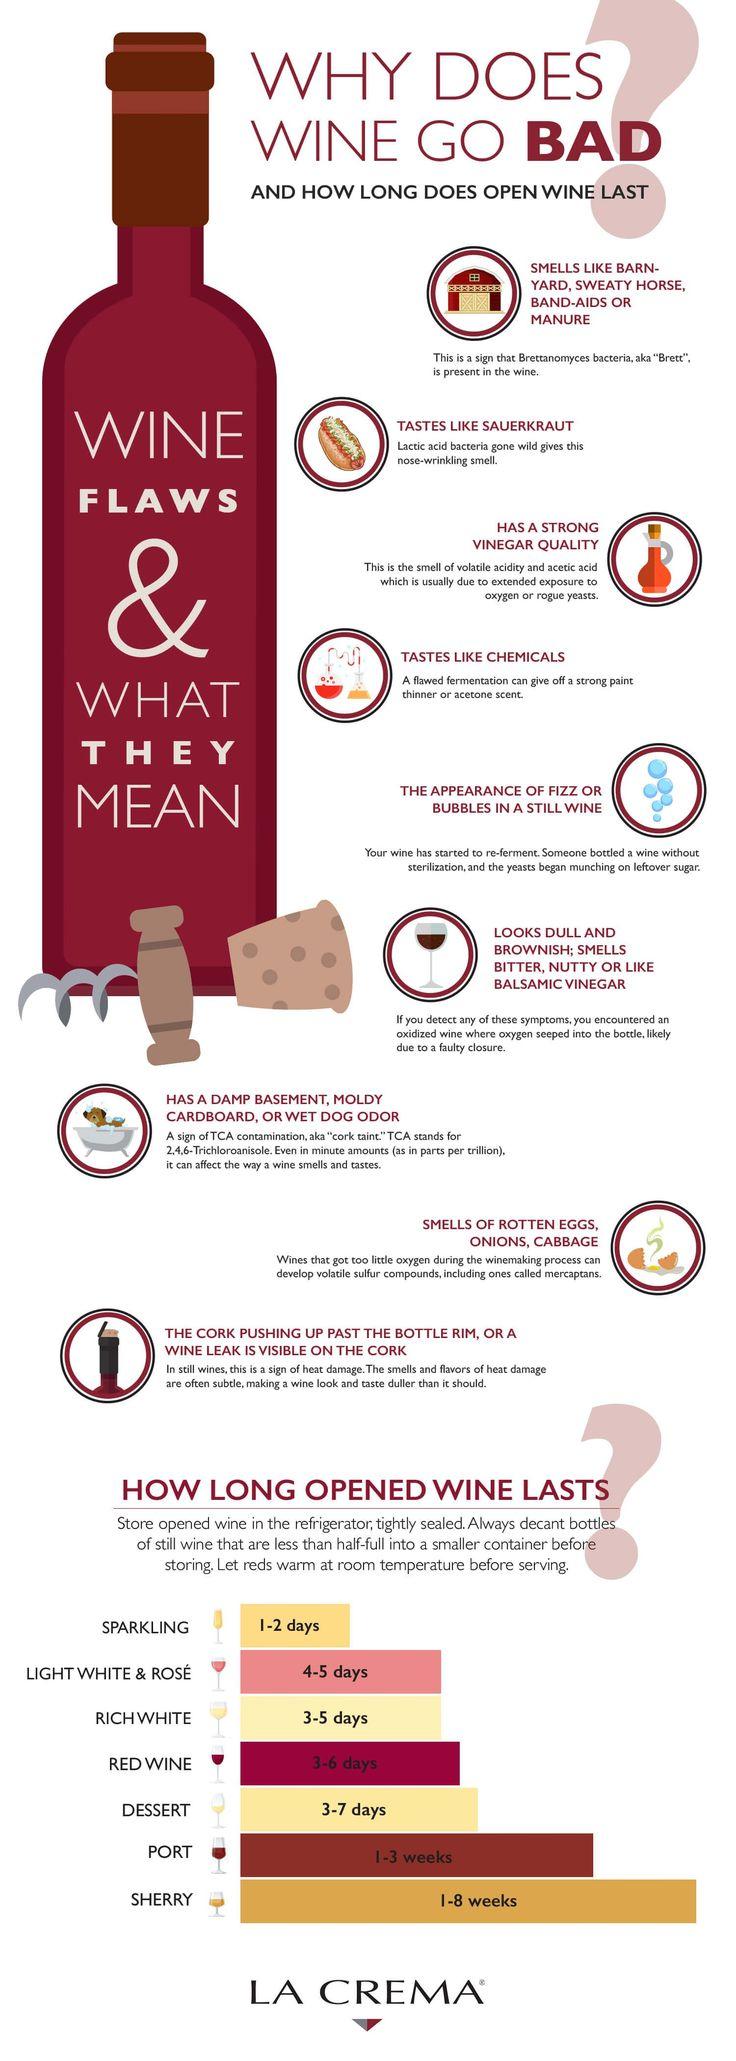 Why Does Wine Go Bad | LaCrema.com #winetime